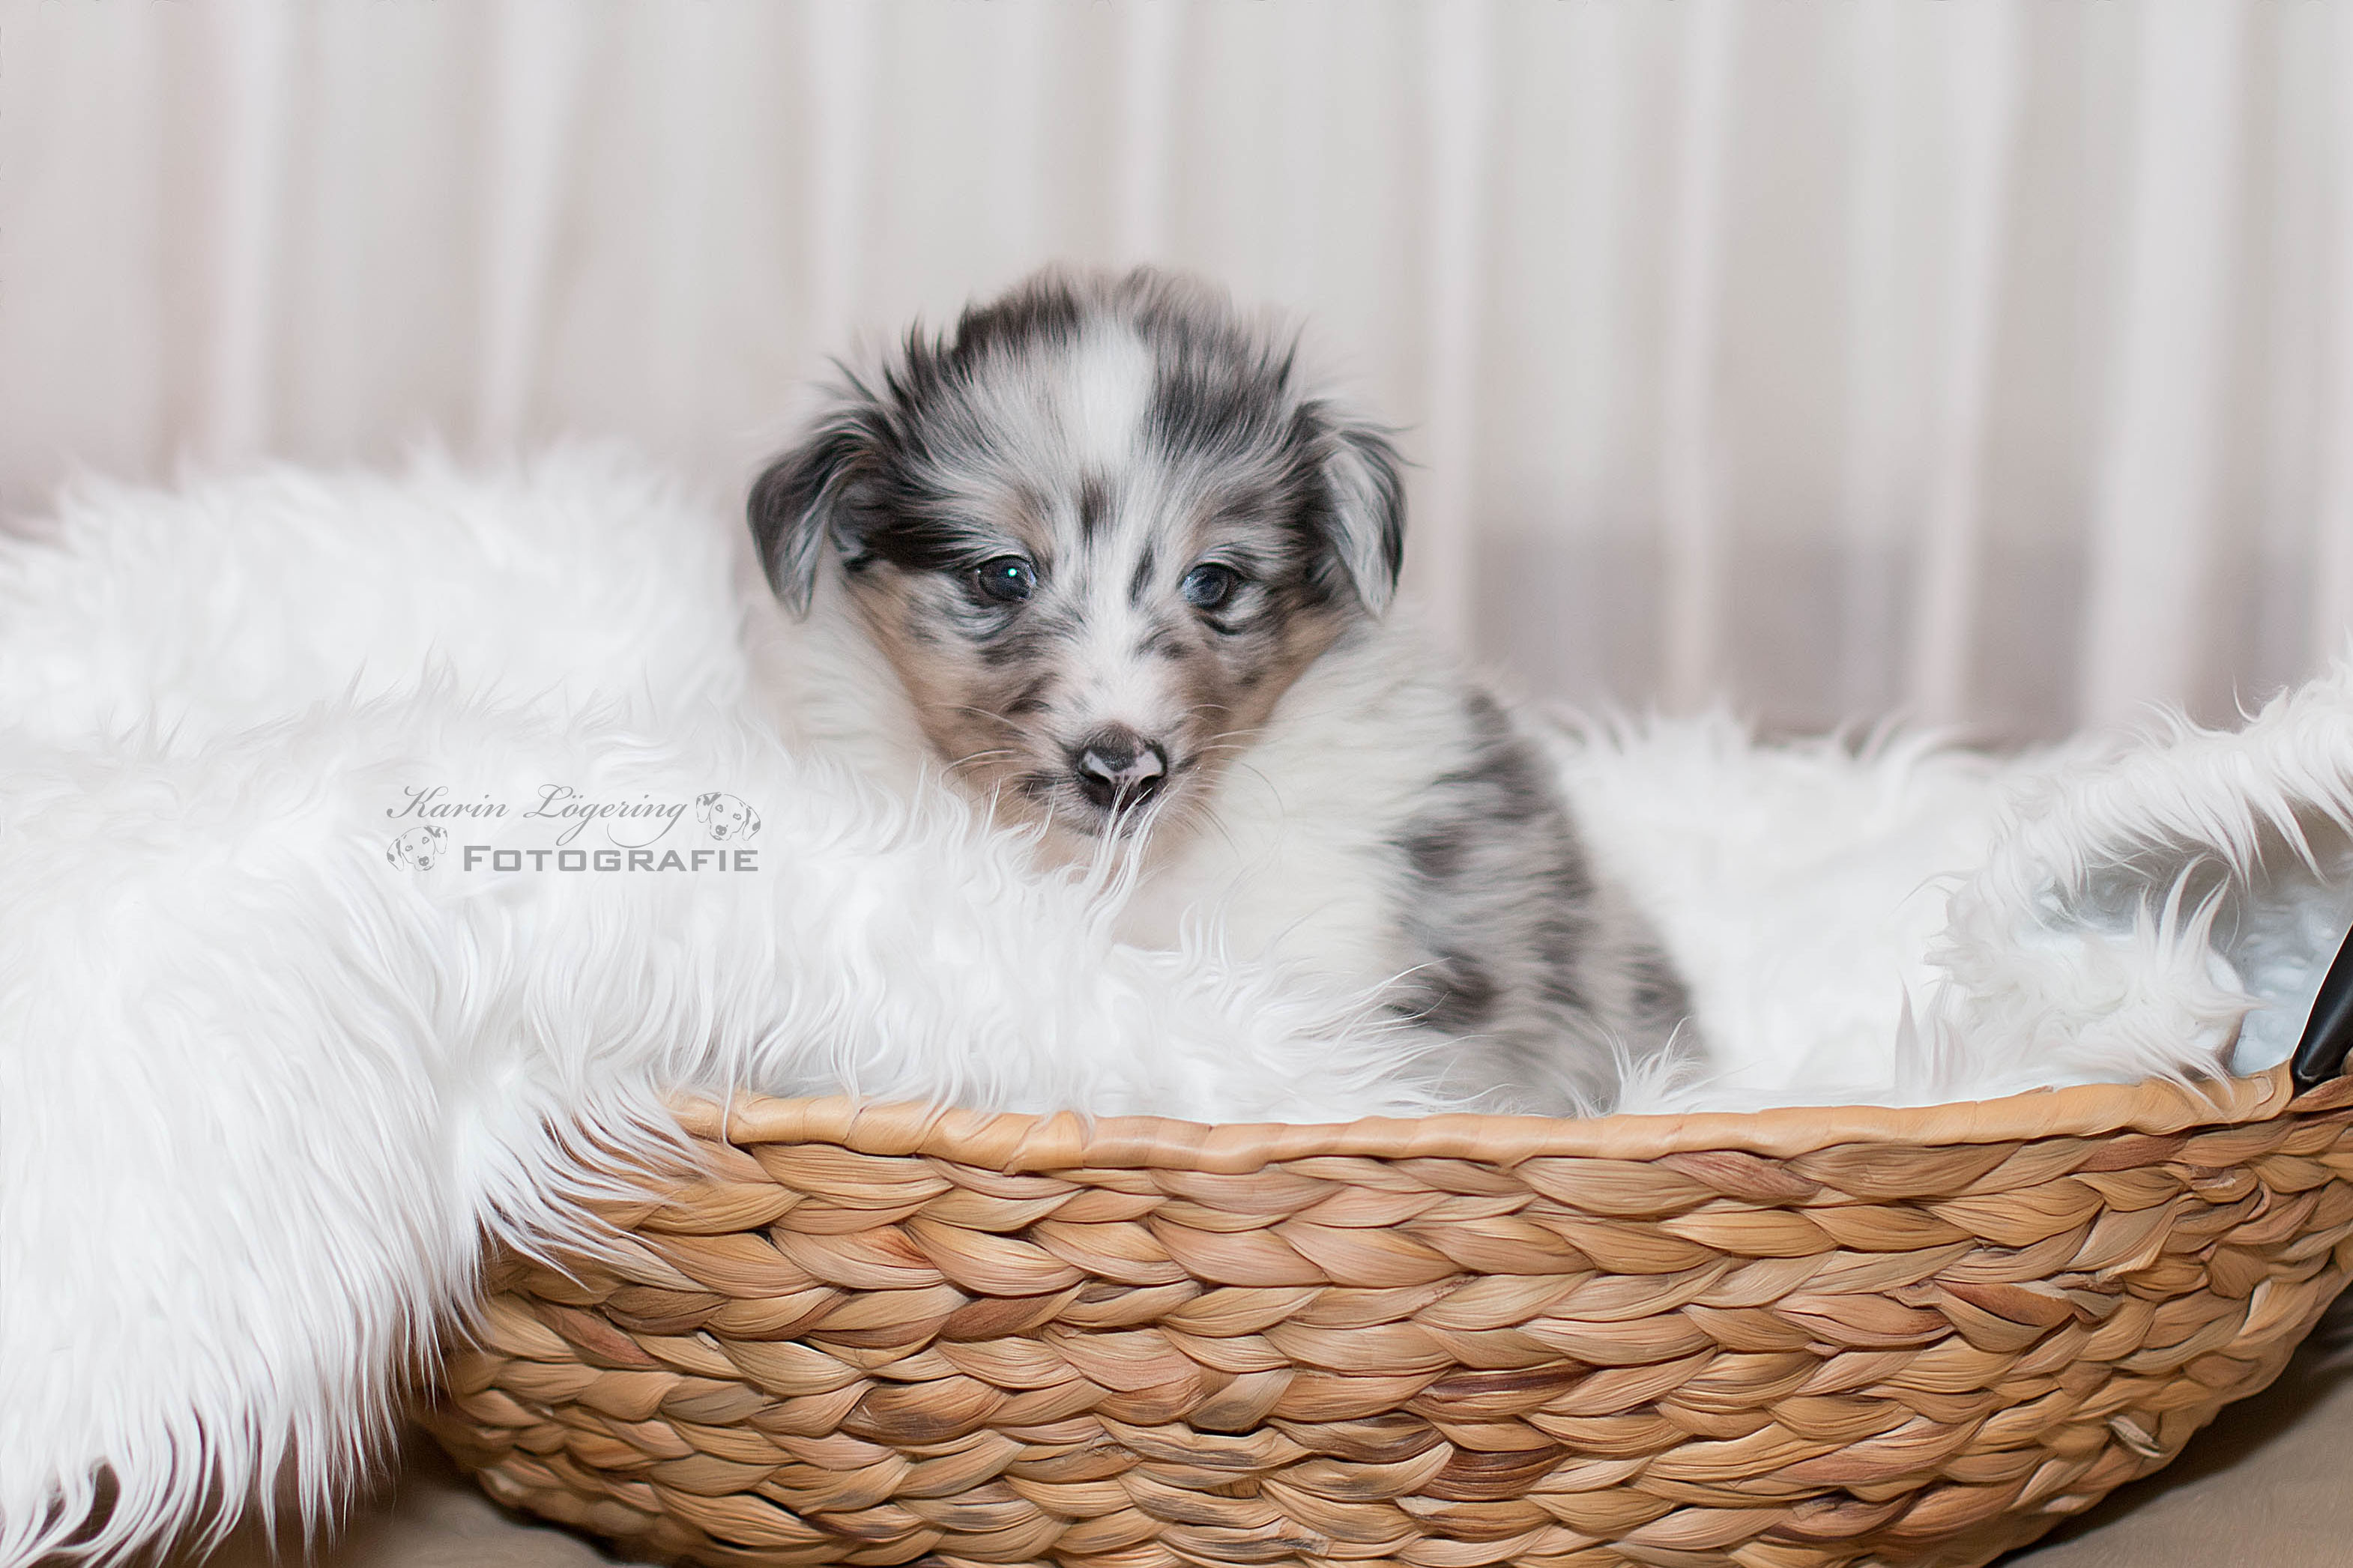 Garwin 5 Wochen alt